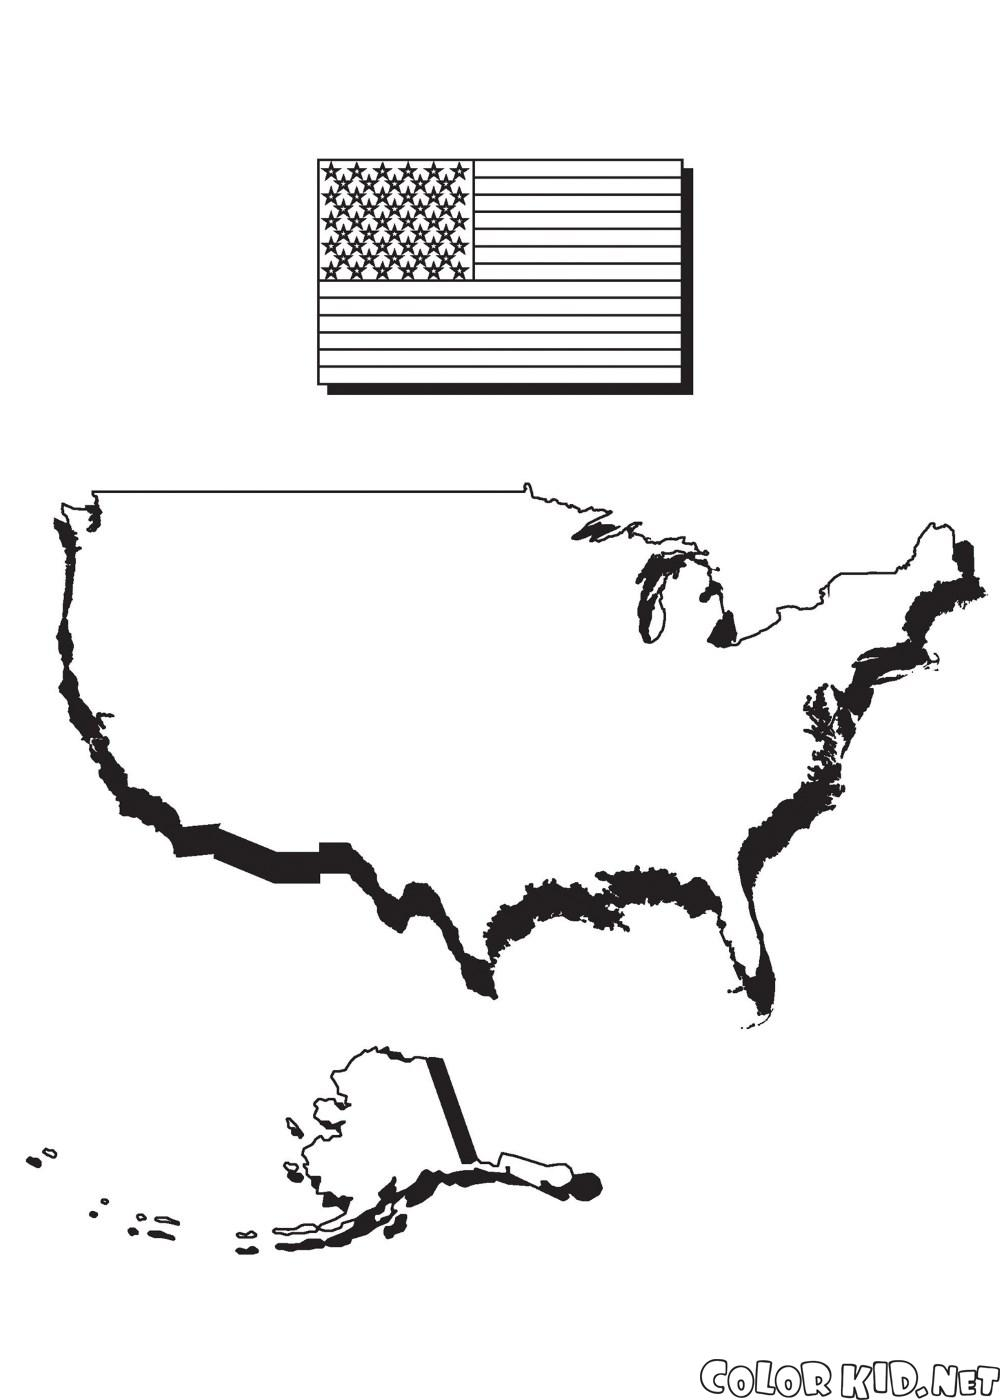 Карта Америки и флаг